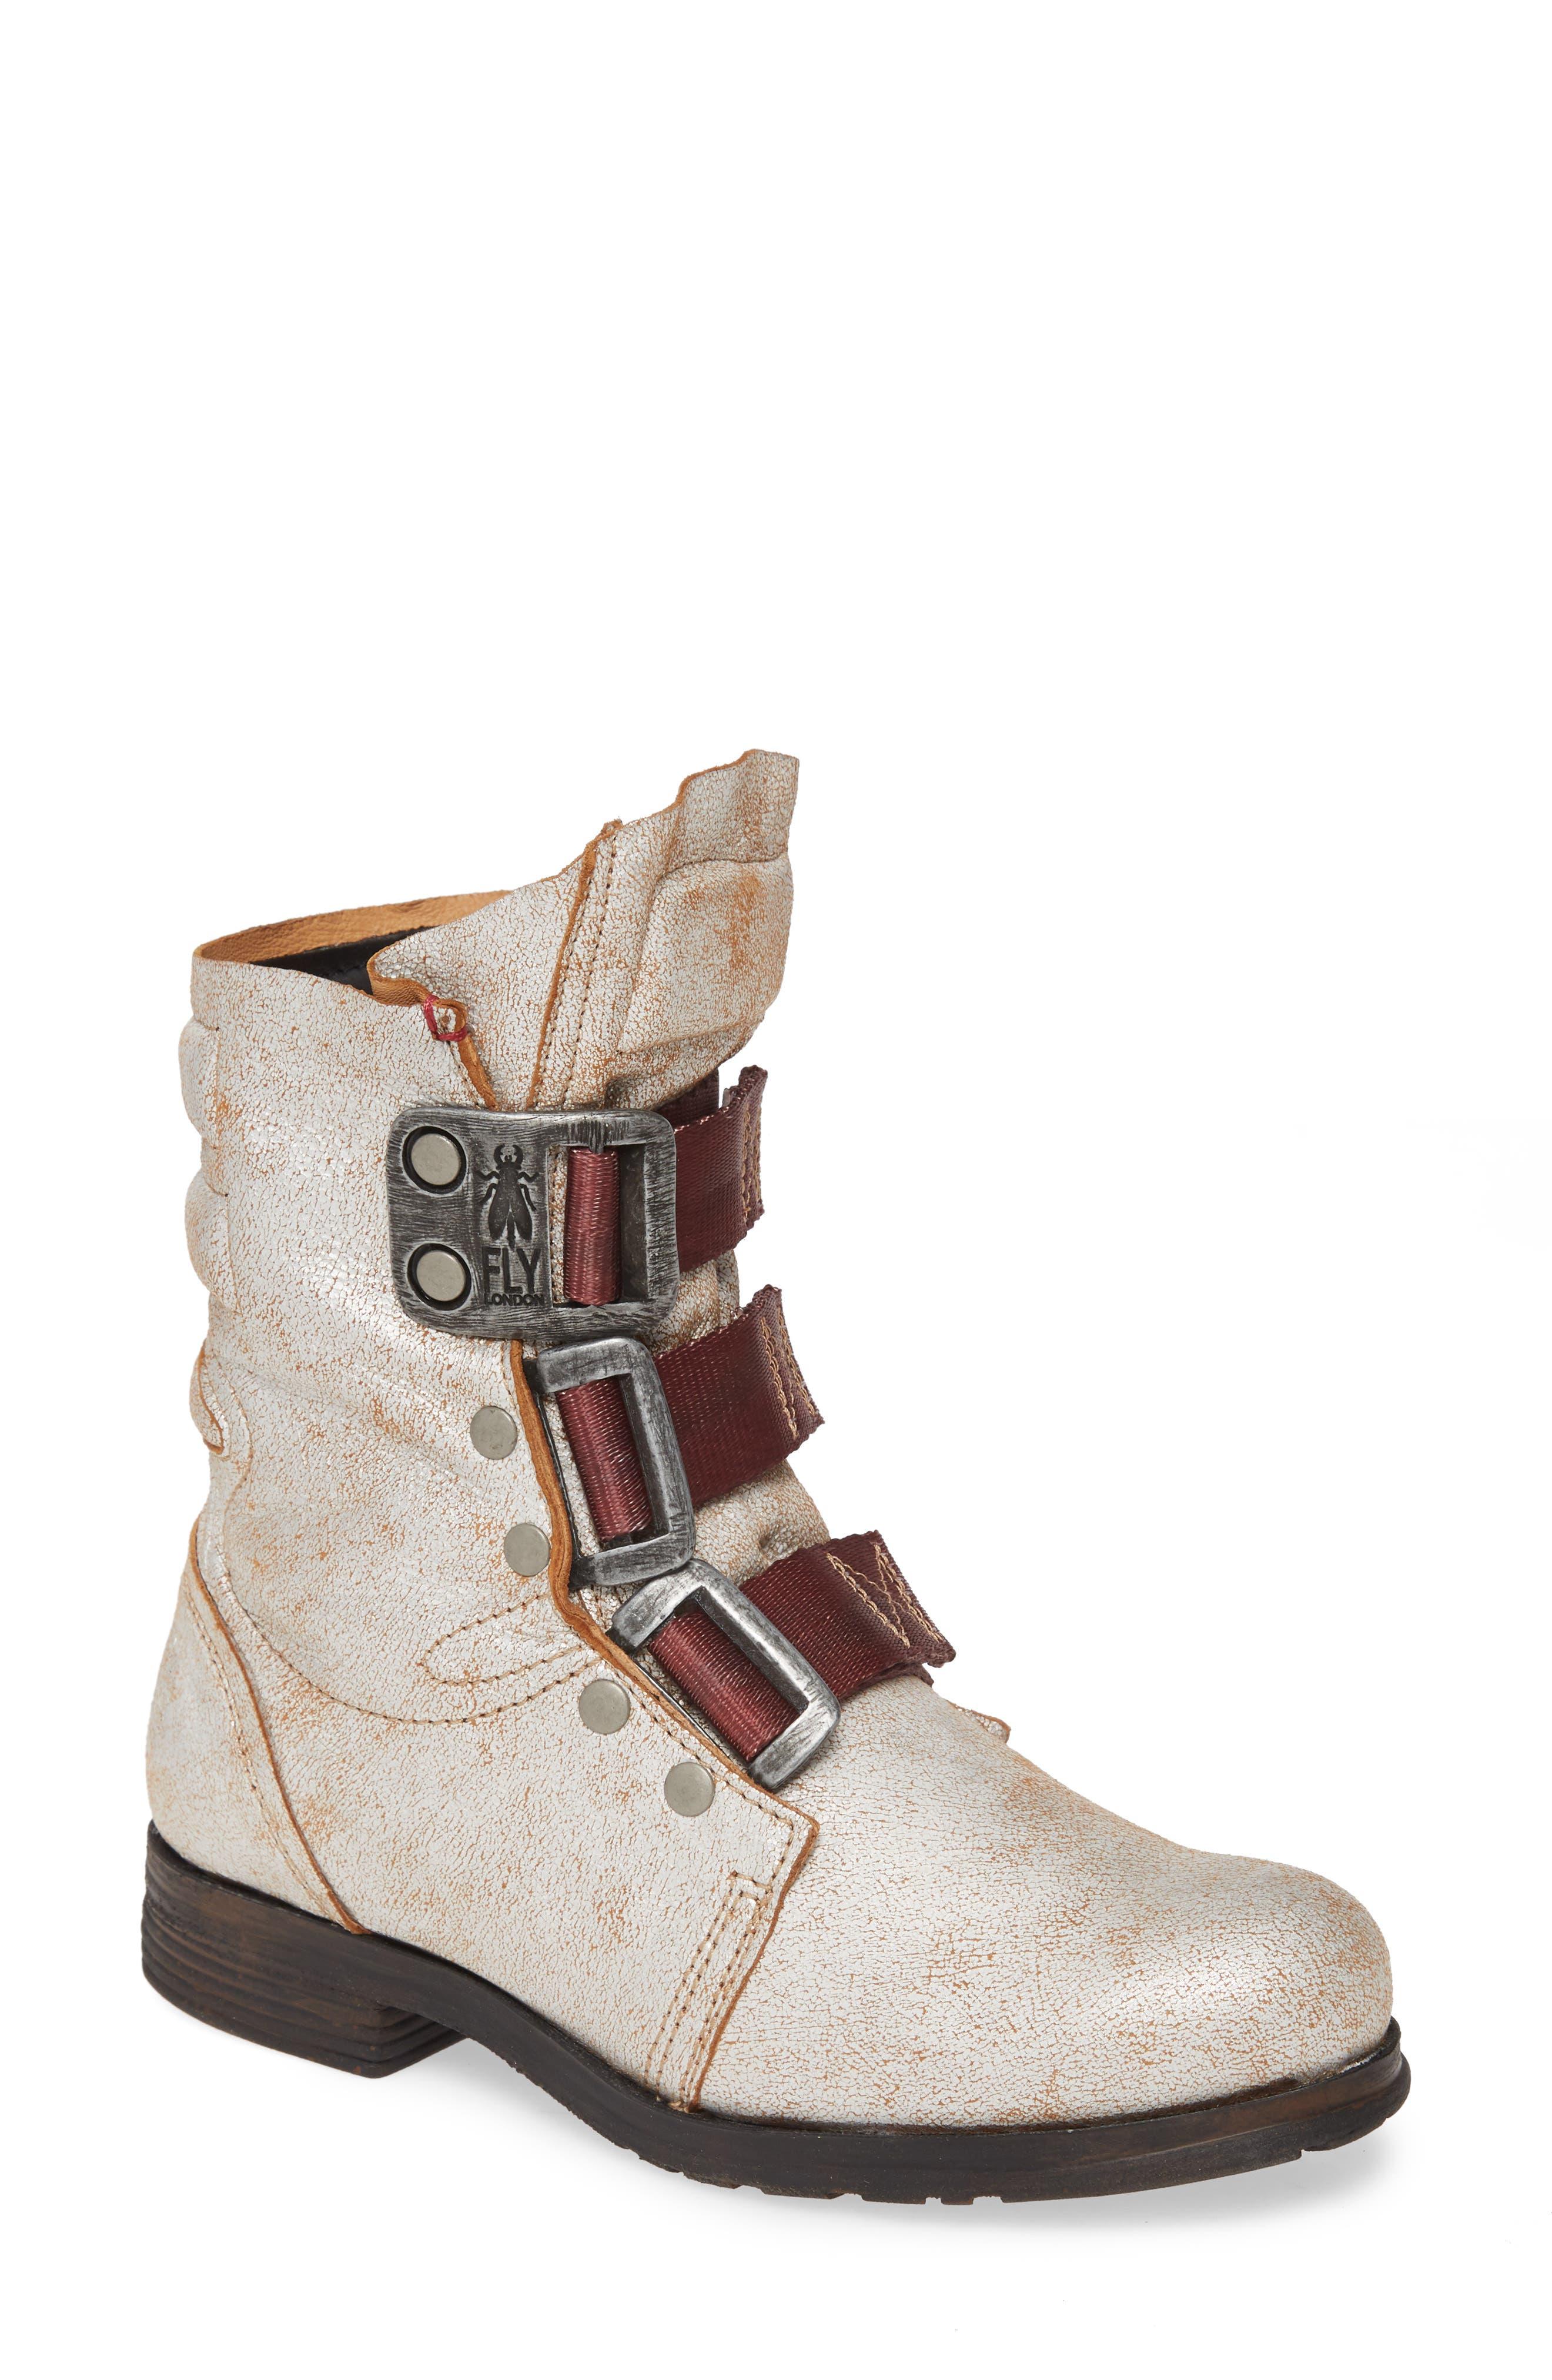 Fly London 'Stif' Military Boot (Women)